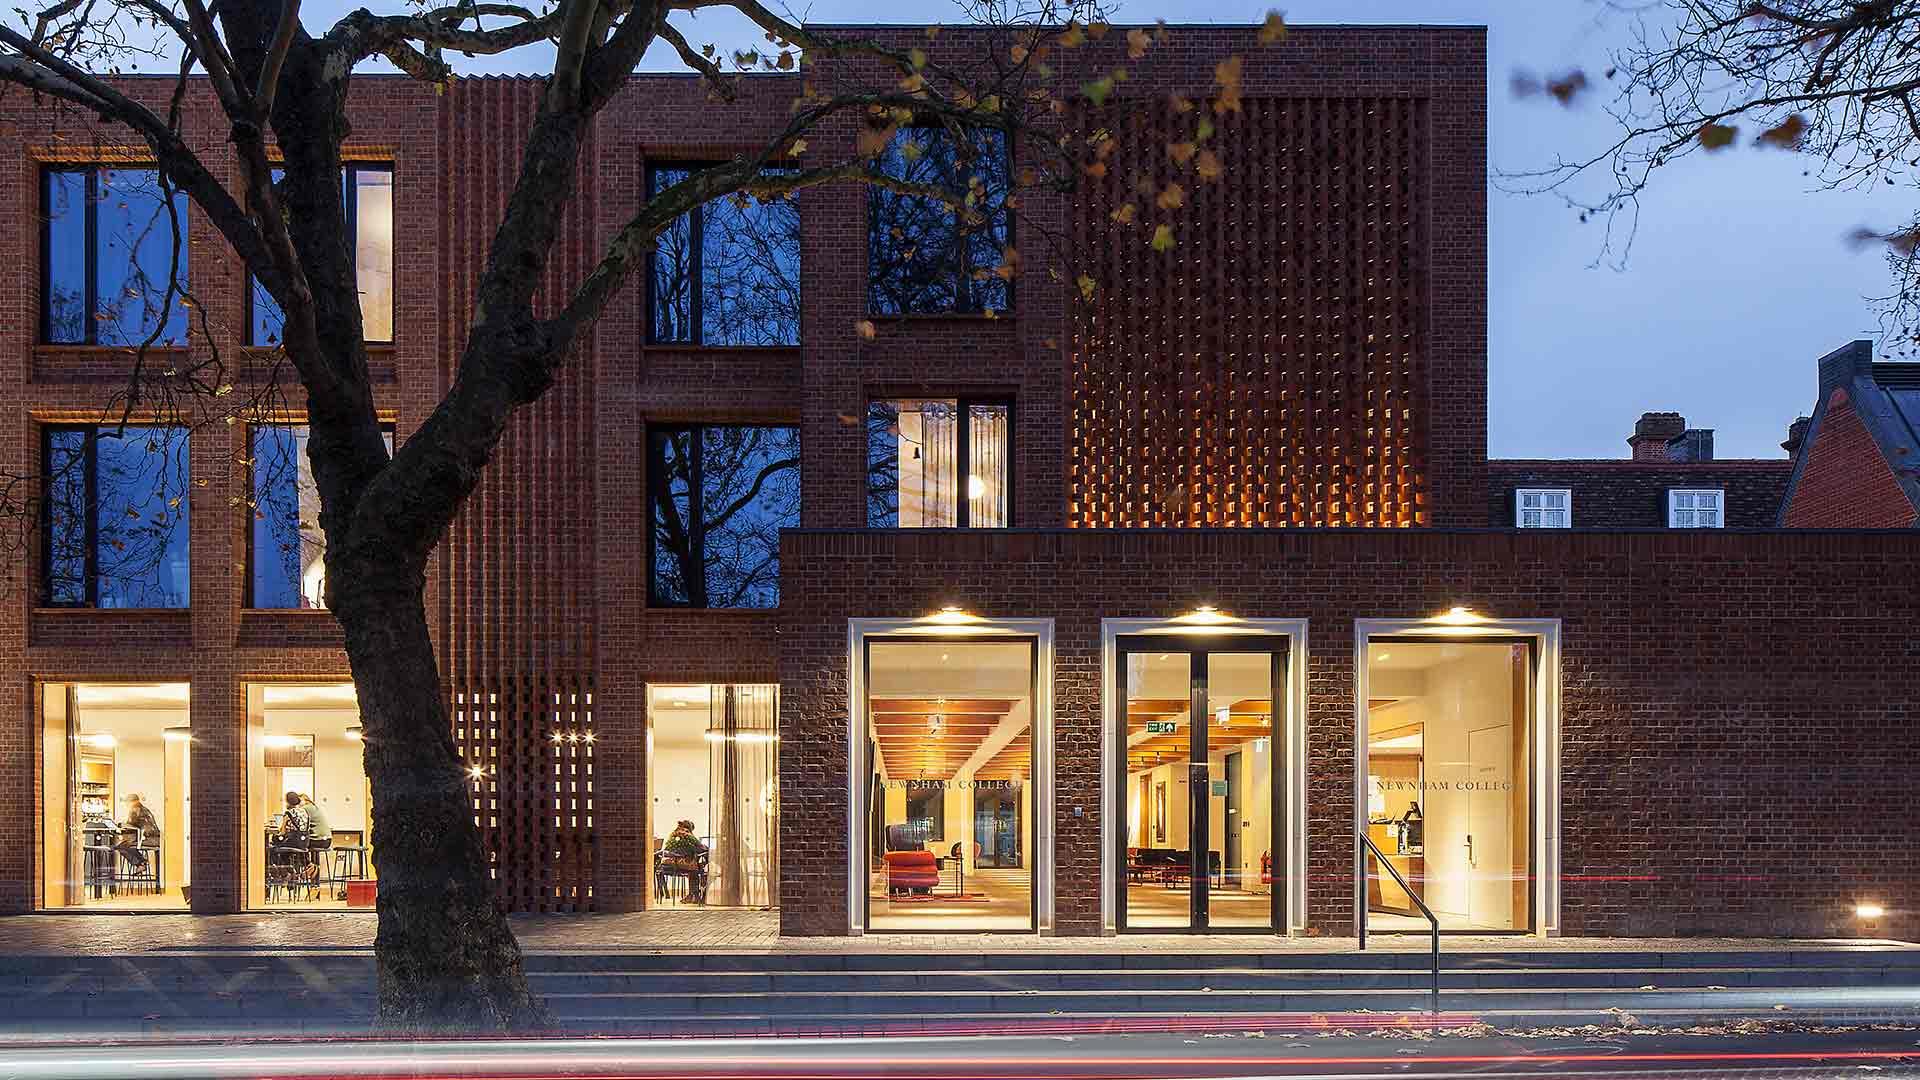 New Contemporary University Building Newnham College Cambridge Exterior Interior Lighting Nulty